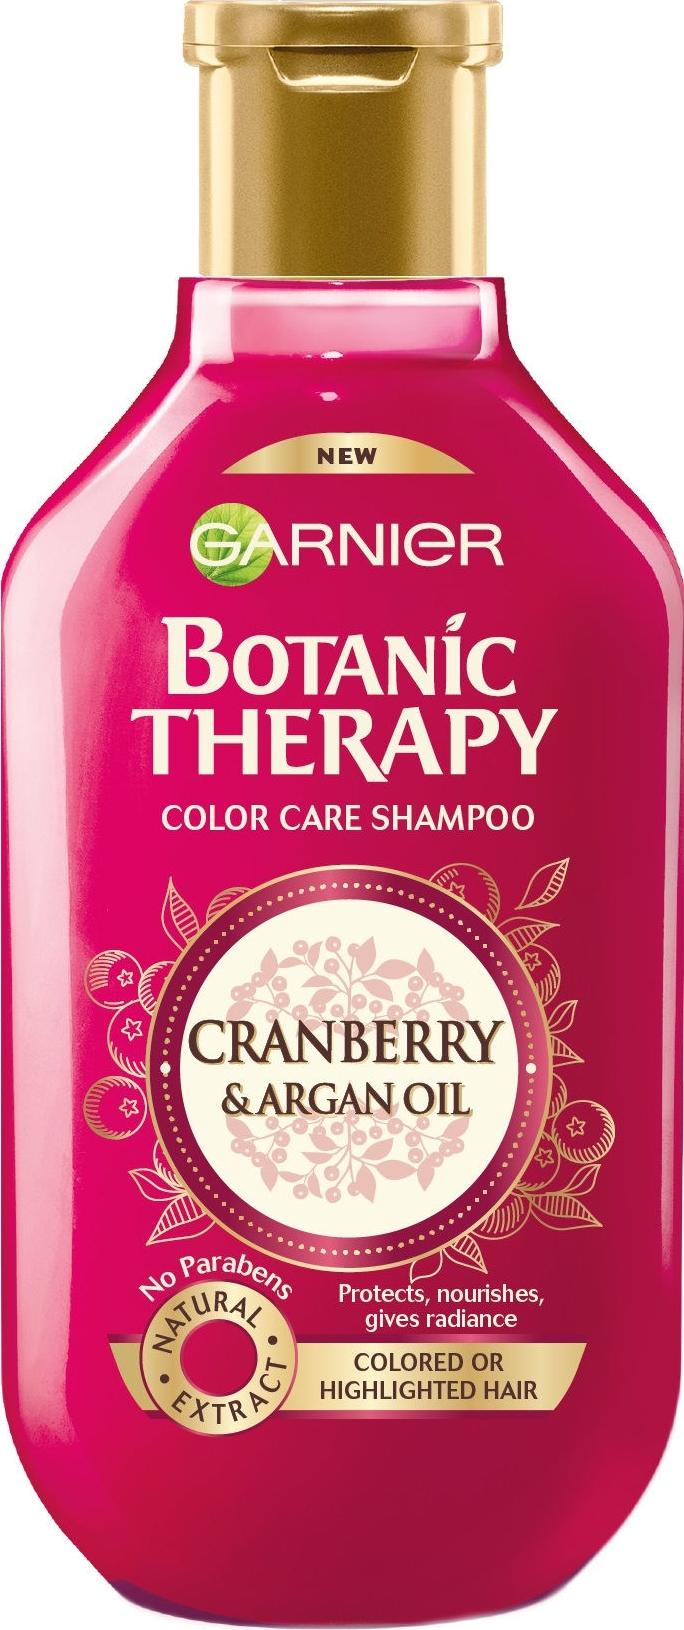 Garnier Botanic Therapy Cranberry & Argan Oil šampon pro barvené a zesvětlené vlasy 250 ml